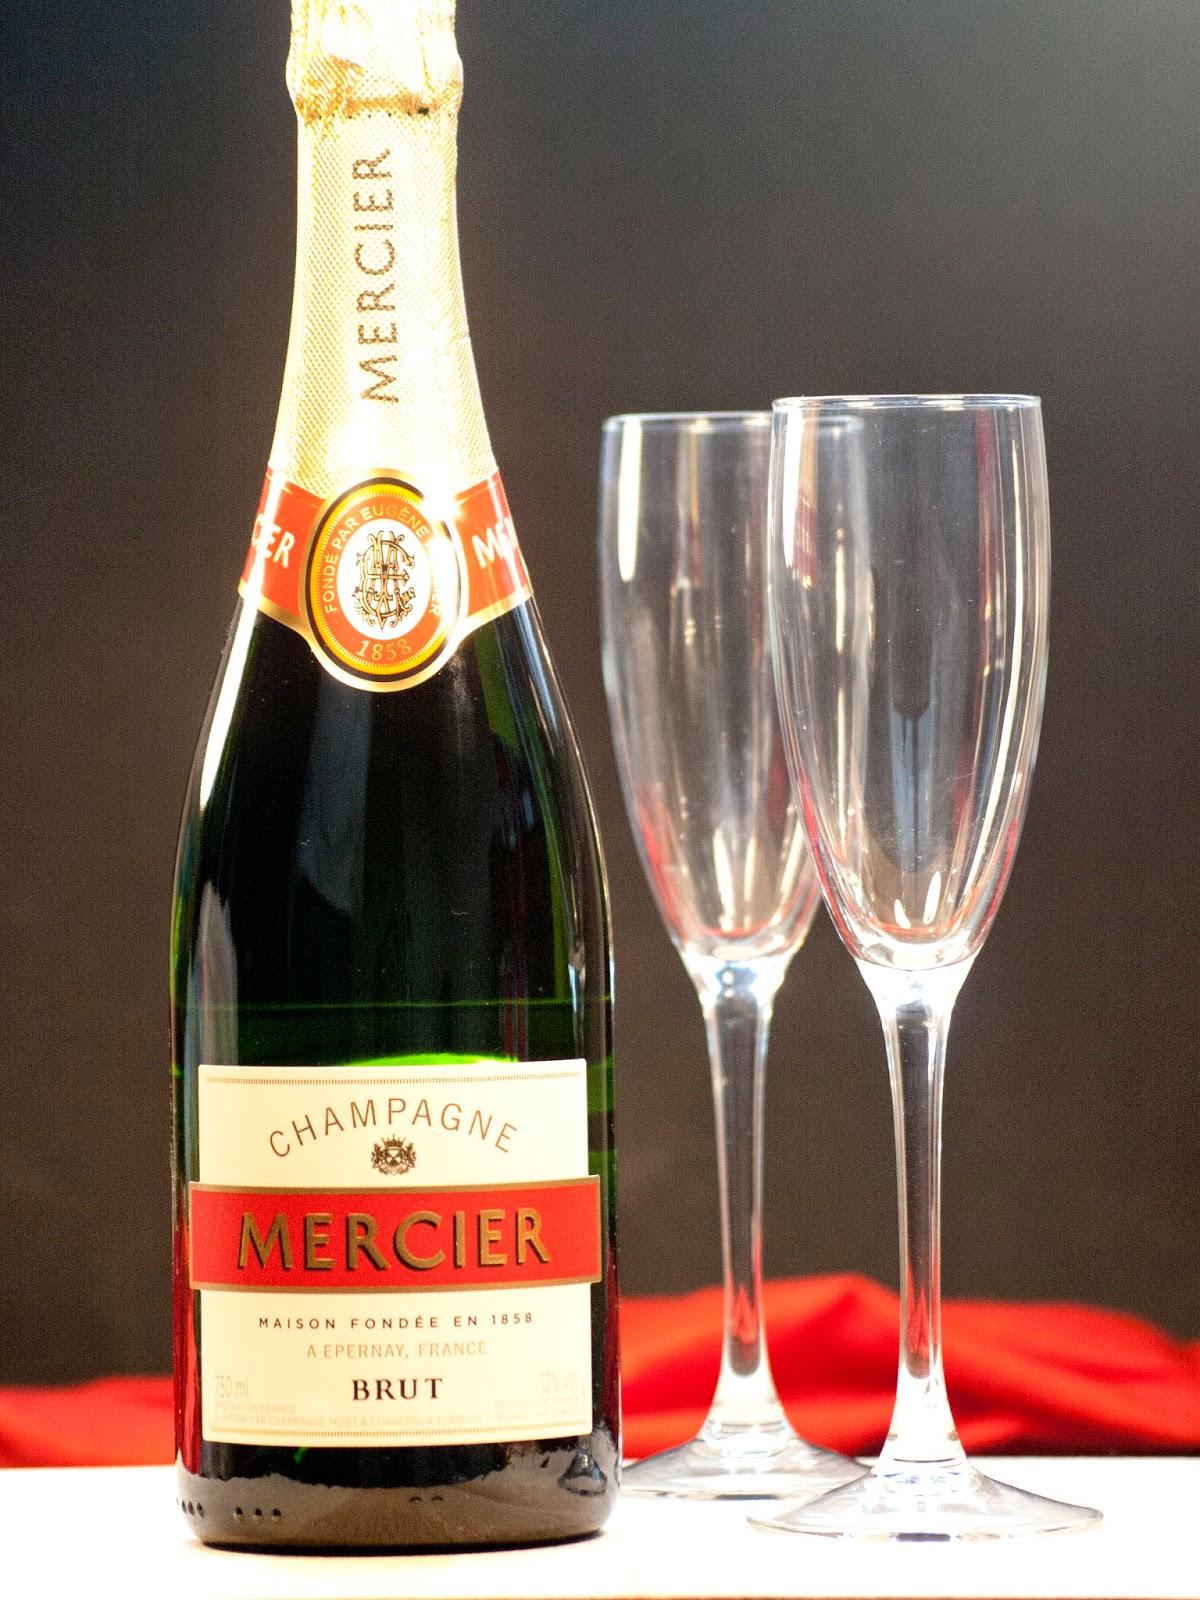 champagne, meilleur champagne, champagne mercier, vieux champagne, qualité champagne, champagne d'or, quel champagne choisir